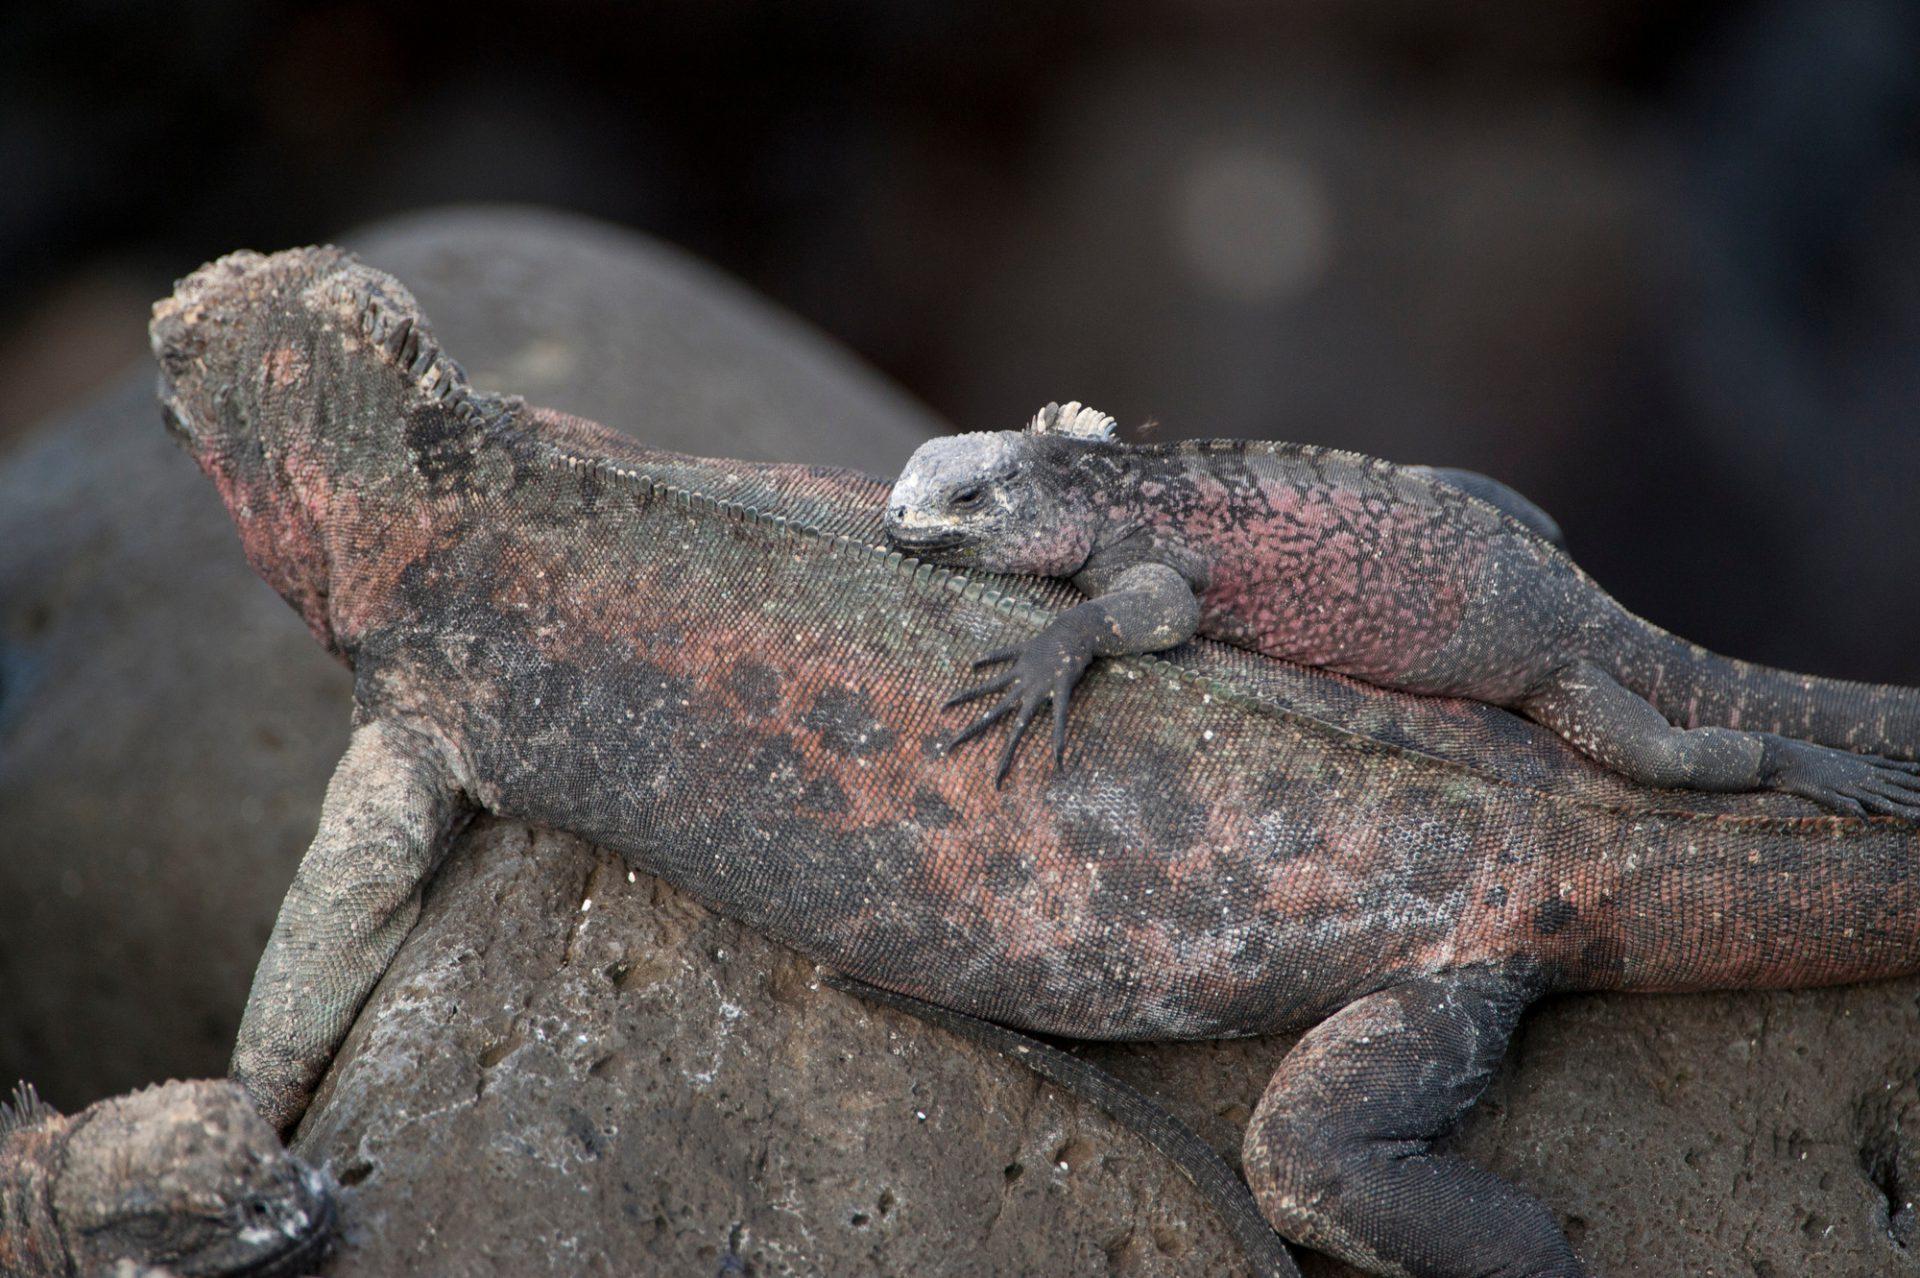 Photo: Espanola marine iguanas, Amblyrhynchus cristatus venustissimus, in Galapagos National Park.